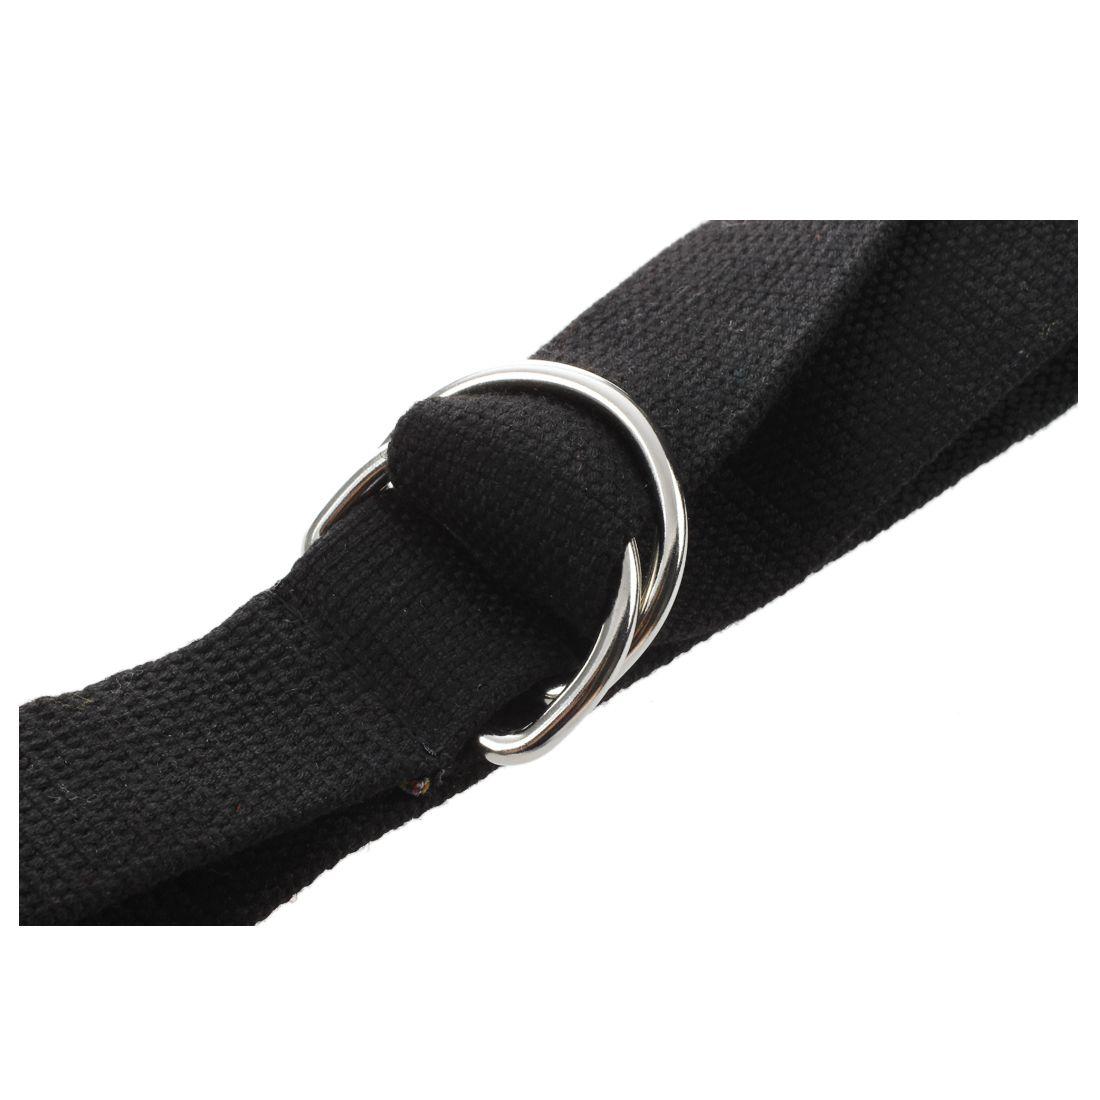 Women-Men-Double-Rings-Waist-Belts-Buckle-Canvas-Waistband-Strap-Casual-Bel-H6E5